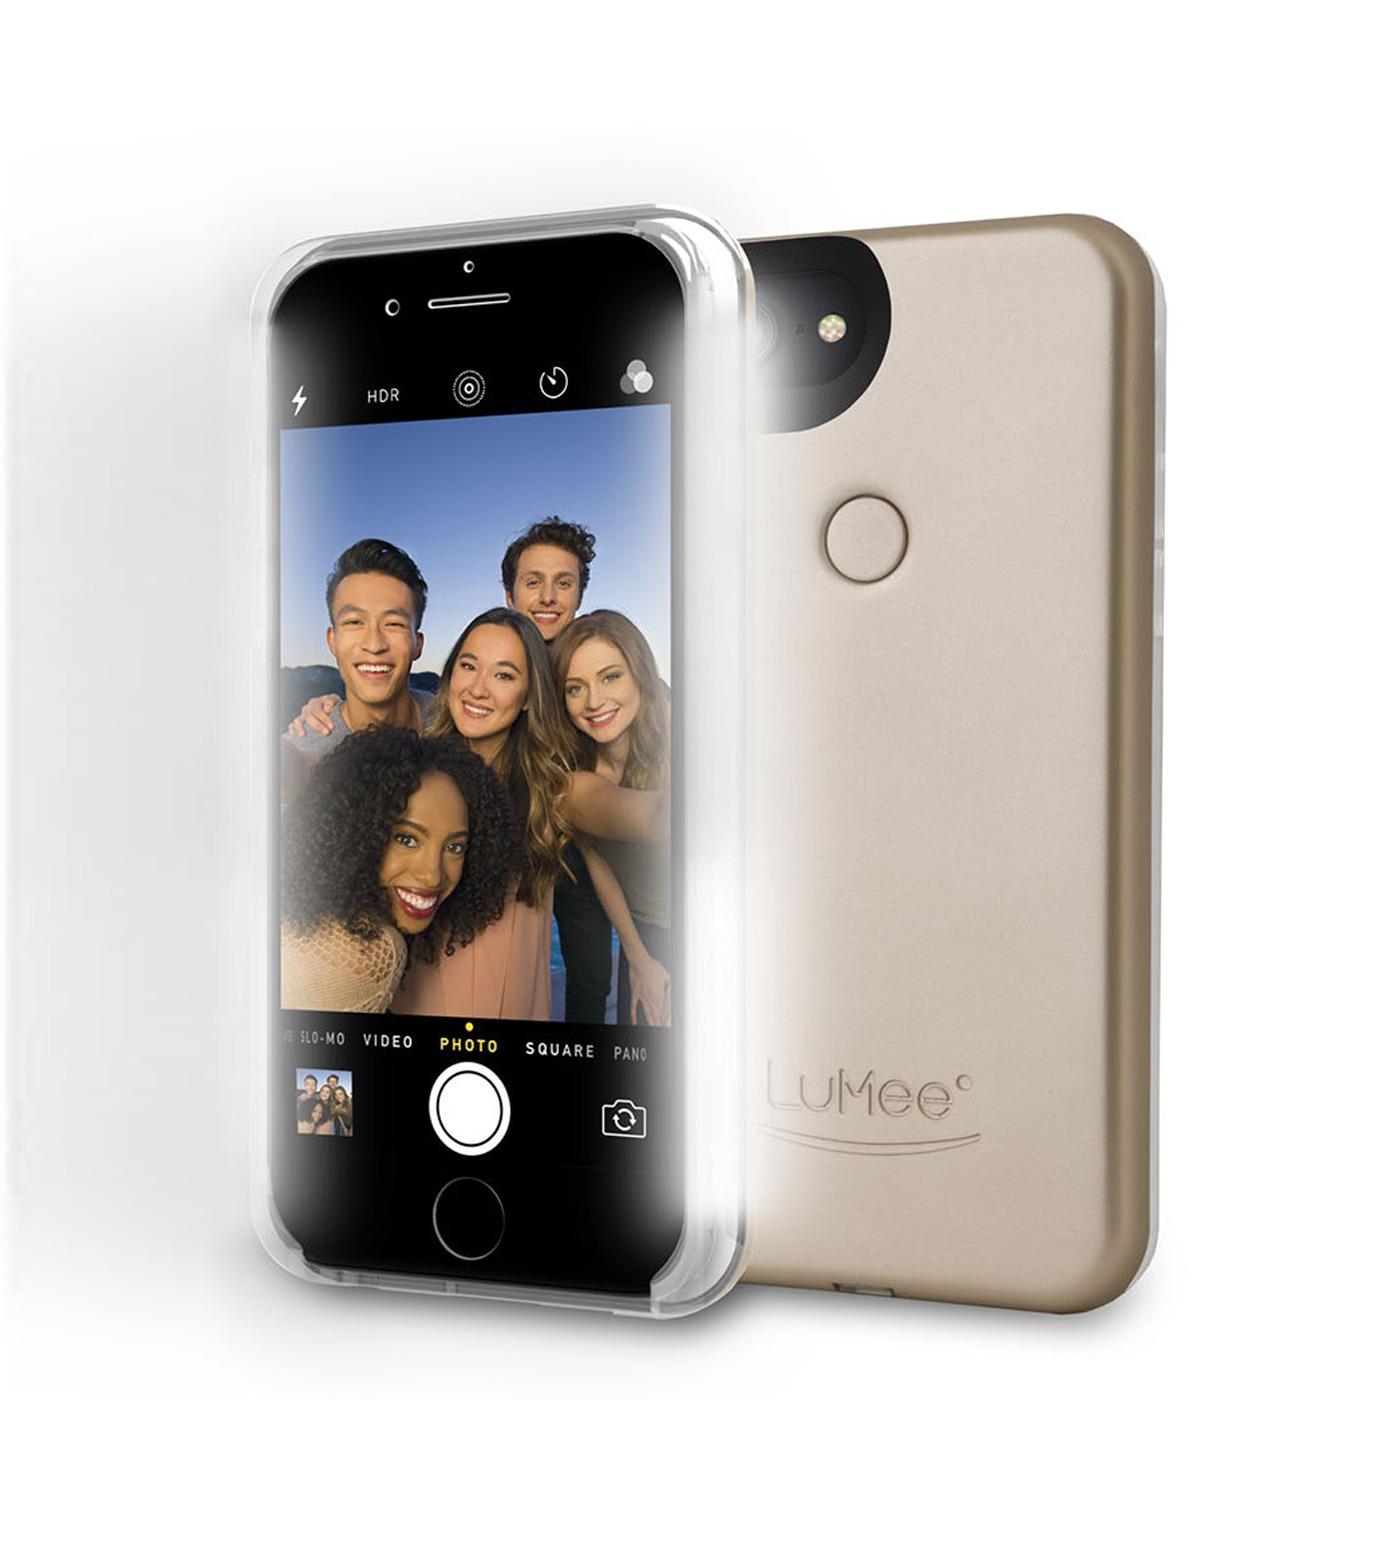 LuMee(ルーミー)のLuMee two iPhone 6/6s/7 - Gold Matte-GOLD(ケースiphone7/7plus/case iphone7/7plus)-L2-IP7-GOLDM-2 拡大詳細画像3